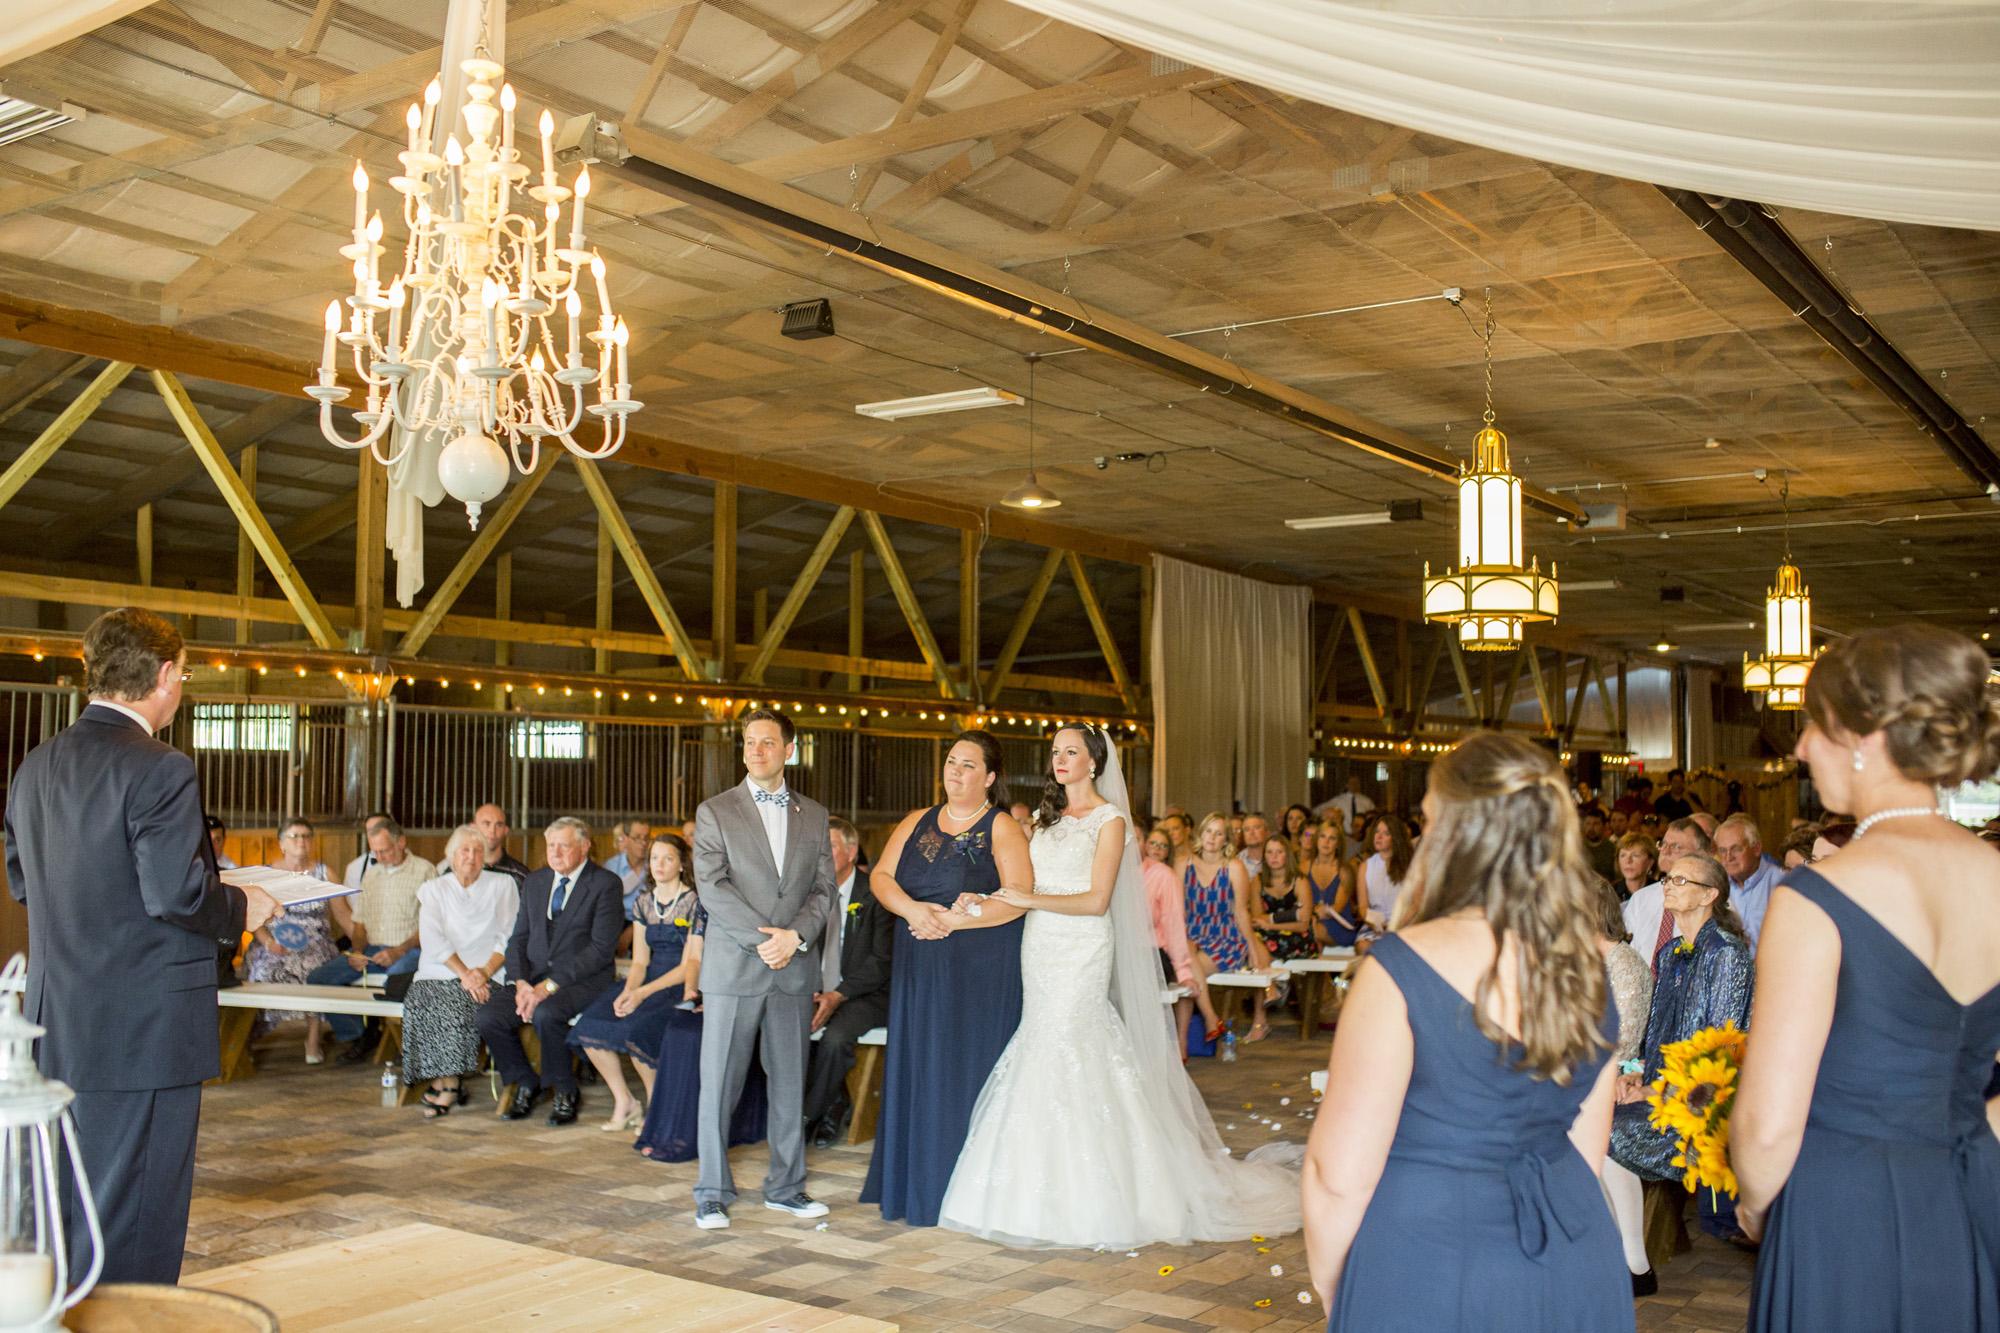 Seriously_Sabrina_Photography_Bowling_Green_Kentucky_Highland_Stables_Wedding_Wolff92.jpg